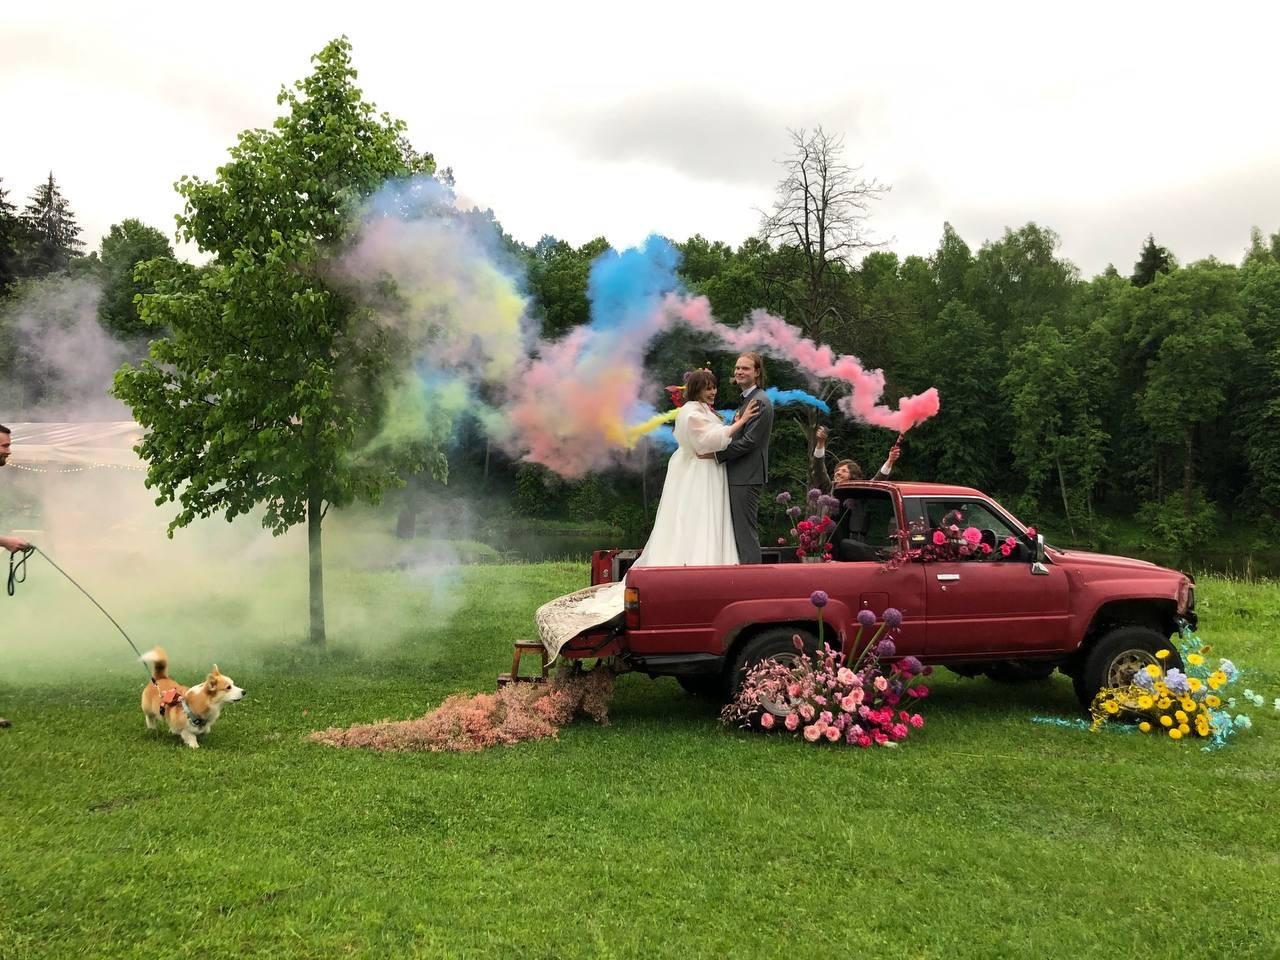 Цветочная поляна: яркая свадьба за городом